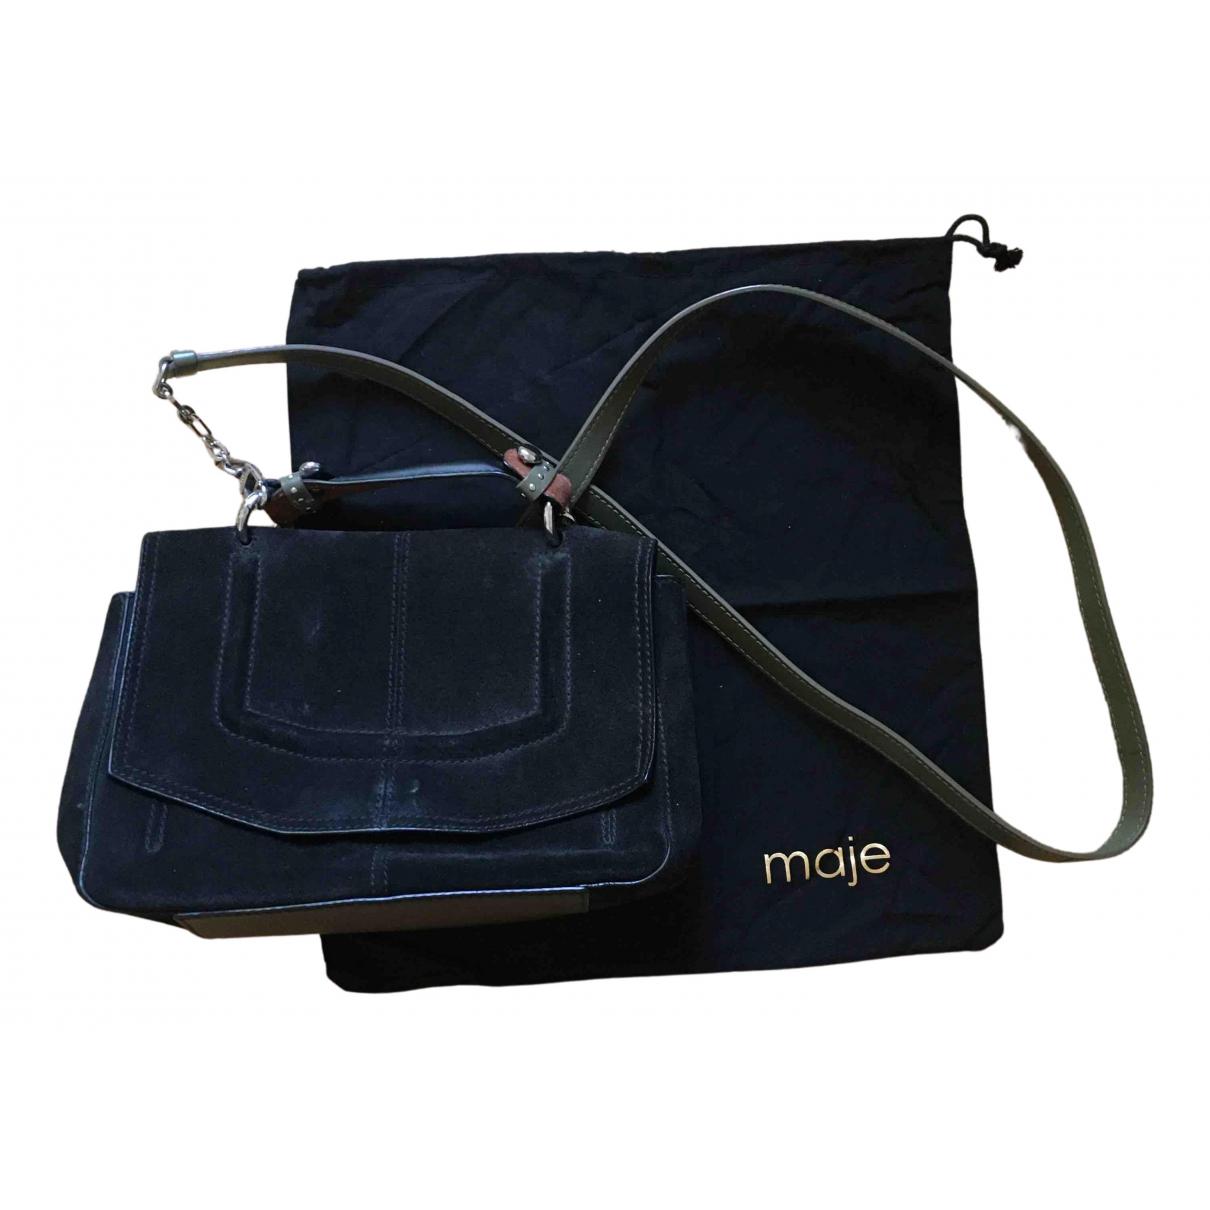 Maje N Black Suede handbag for Women N